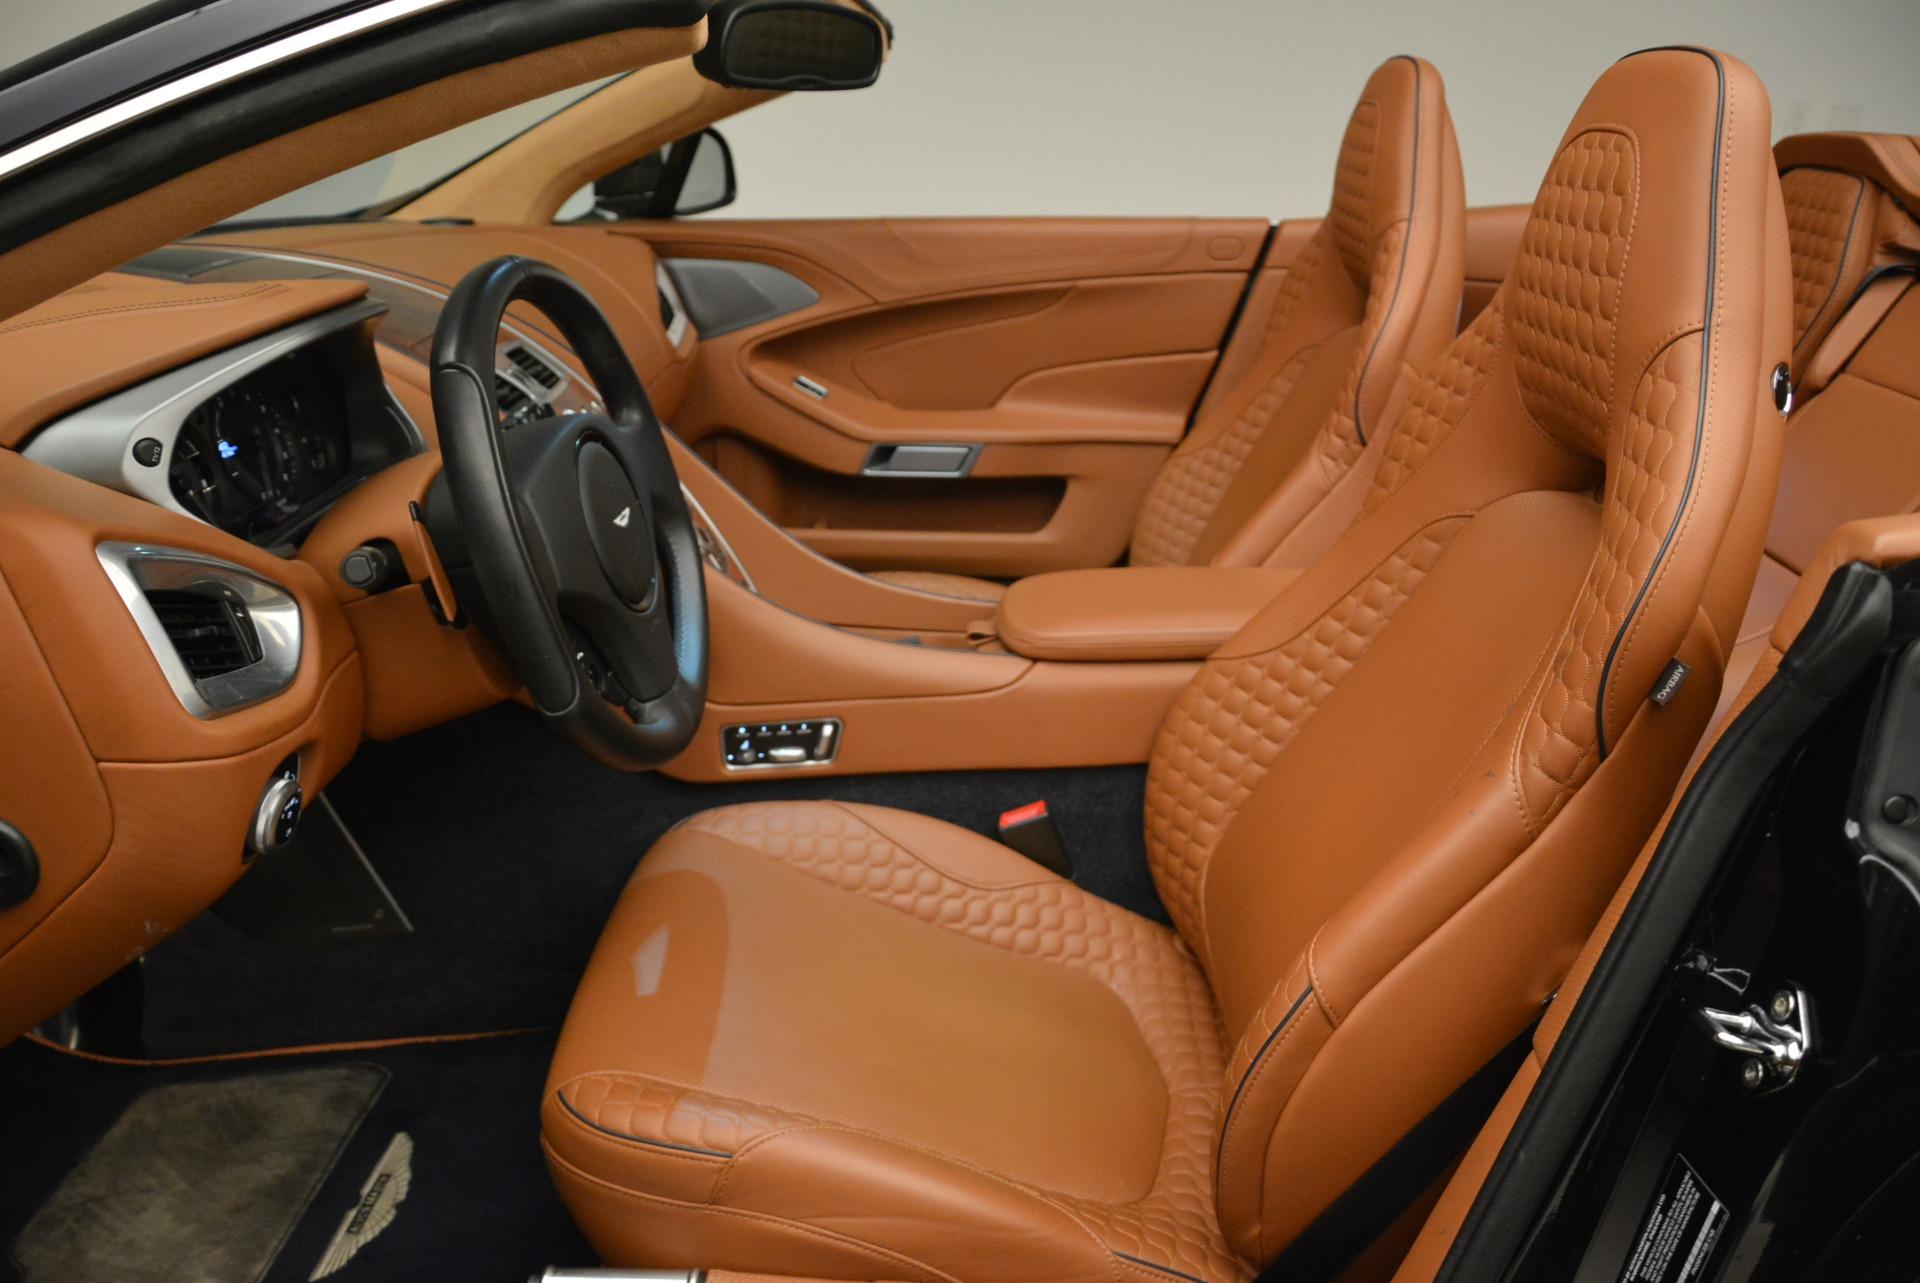 Used 2014 Aston Martin Vanquish Volante For Sale In Westport, CT 2097_p21